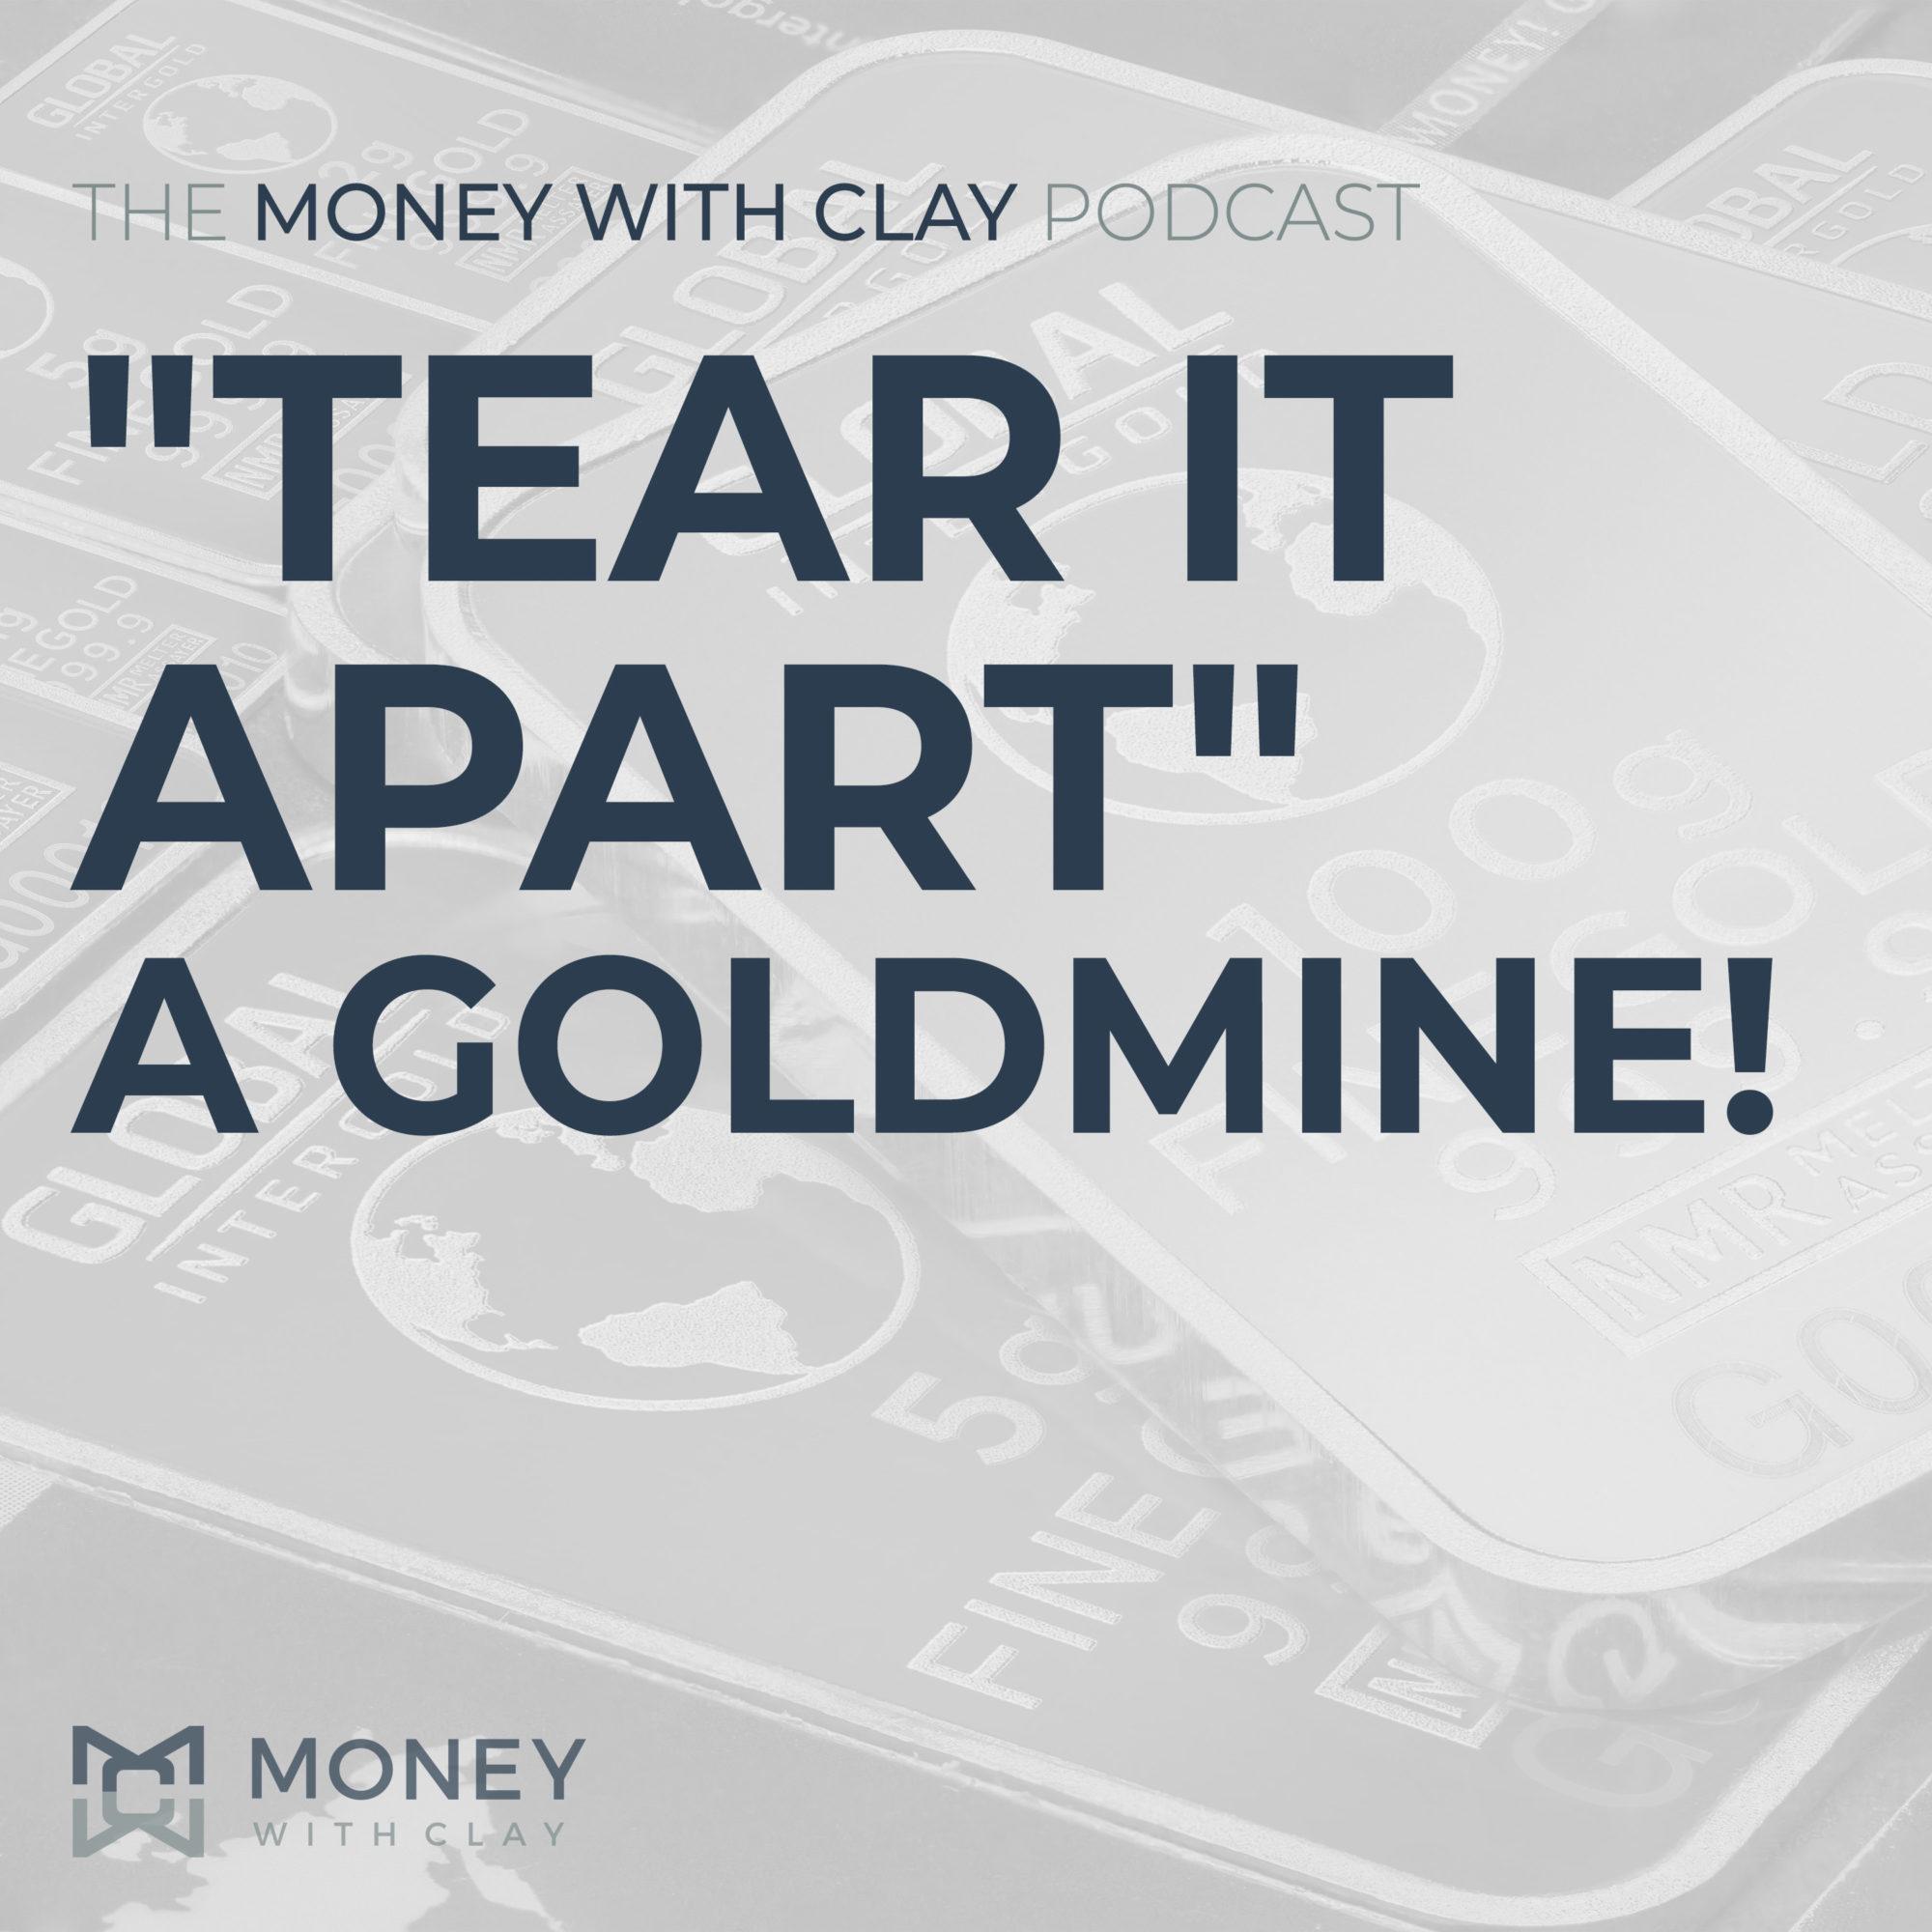 """Tear It Apart"" - A Goldmine! | #098"